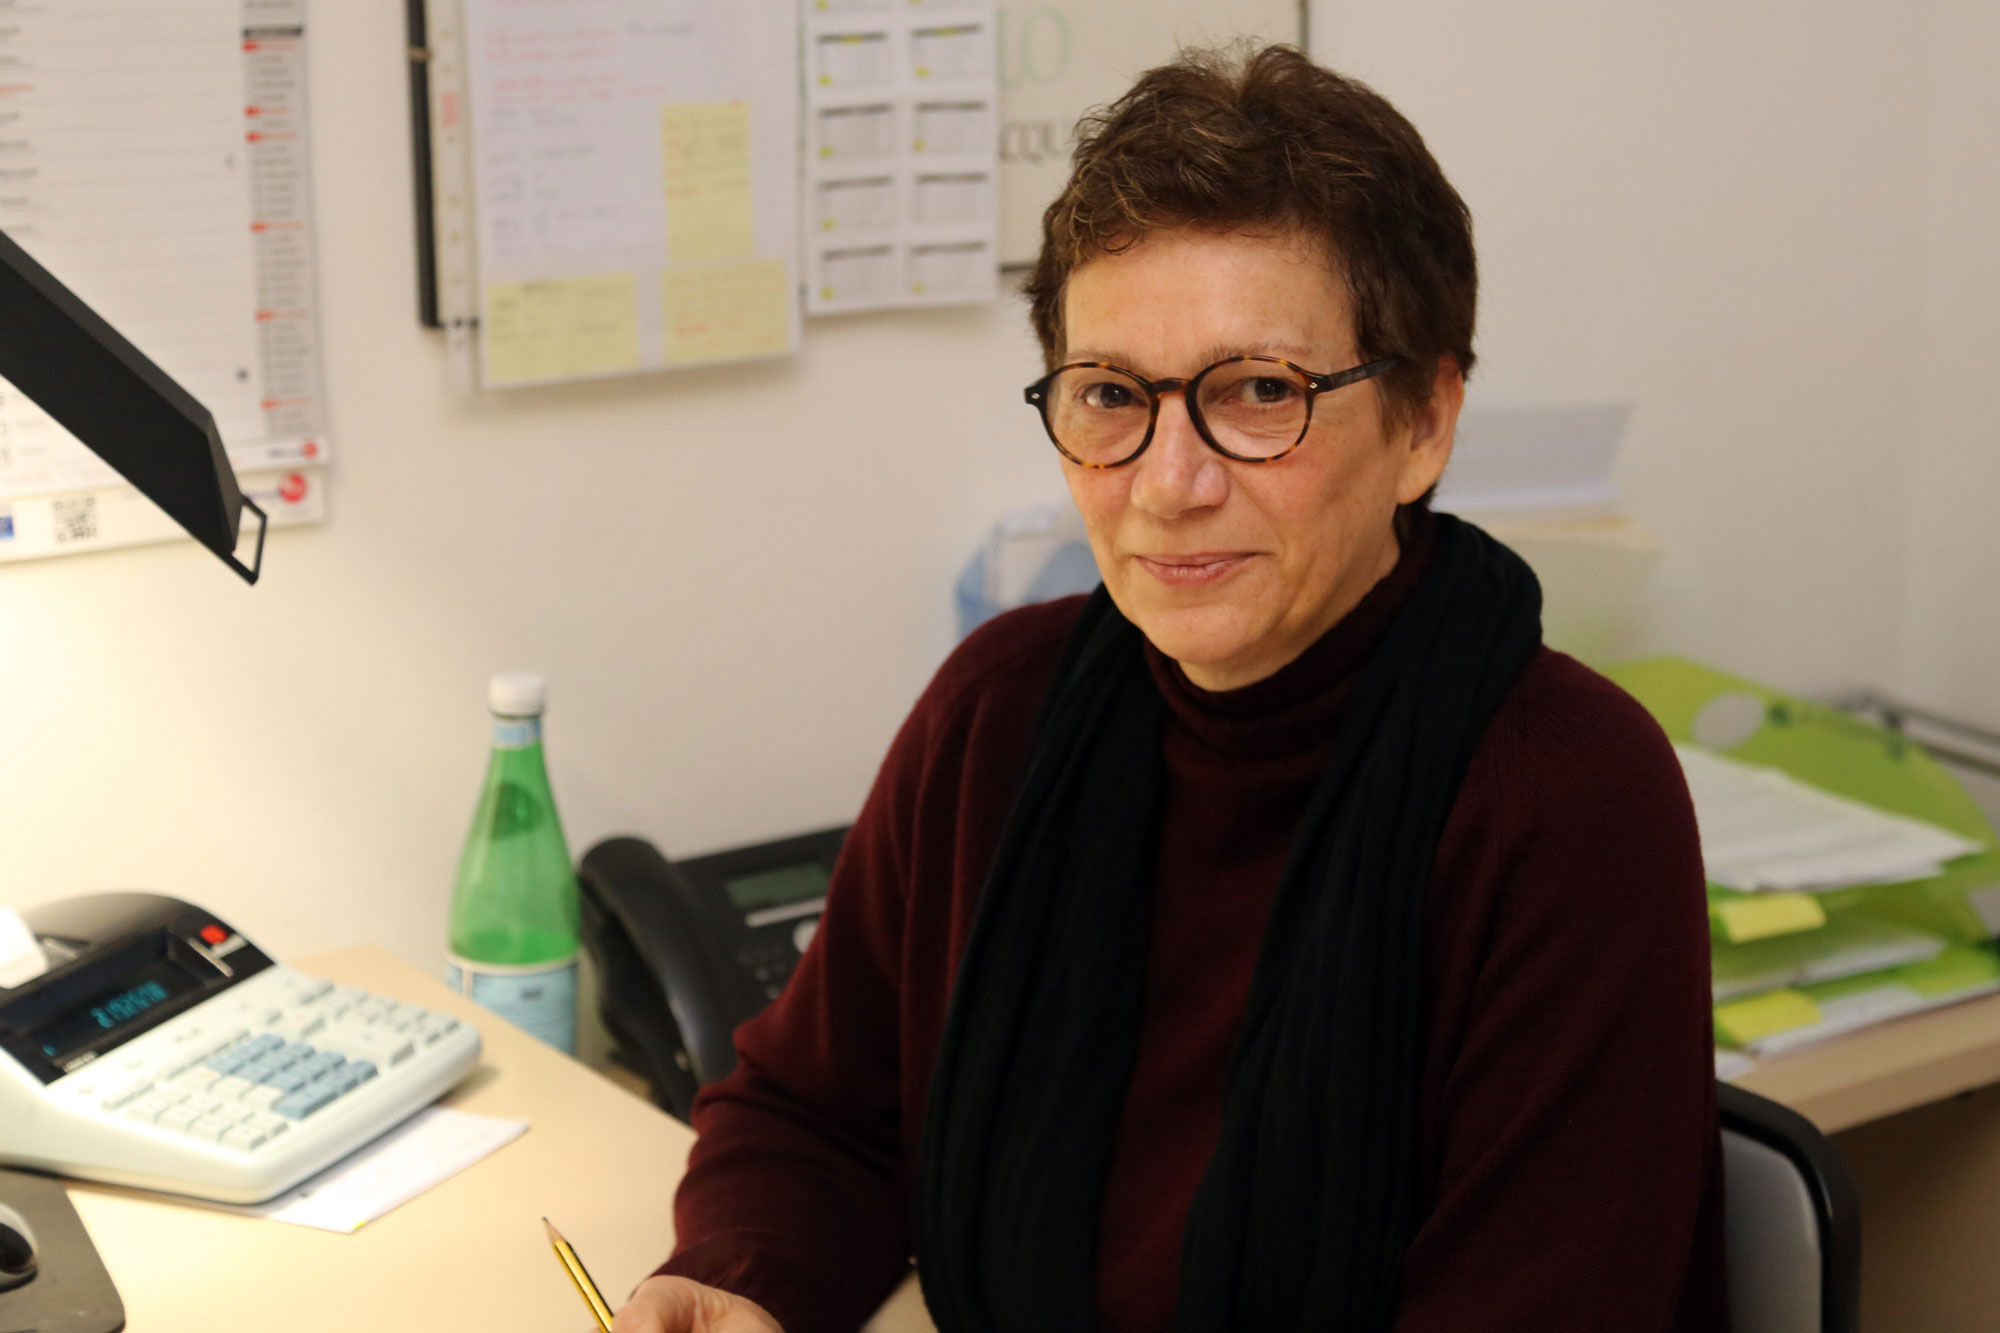 Alessandra Masillo